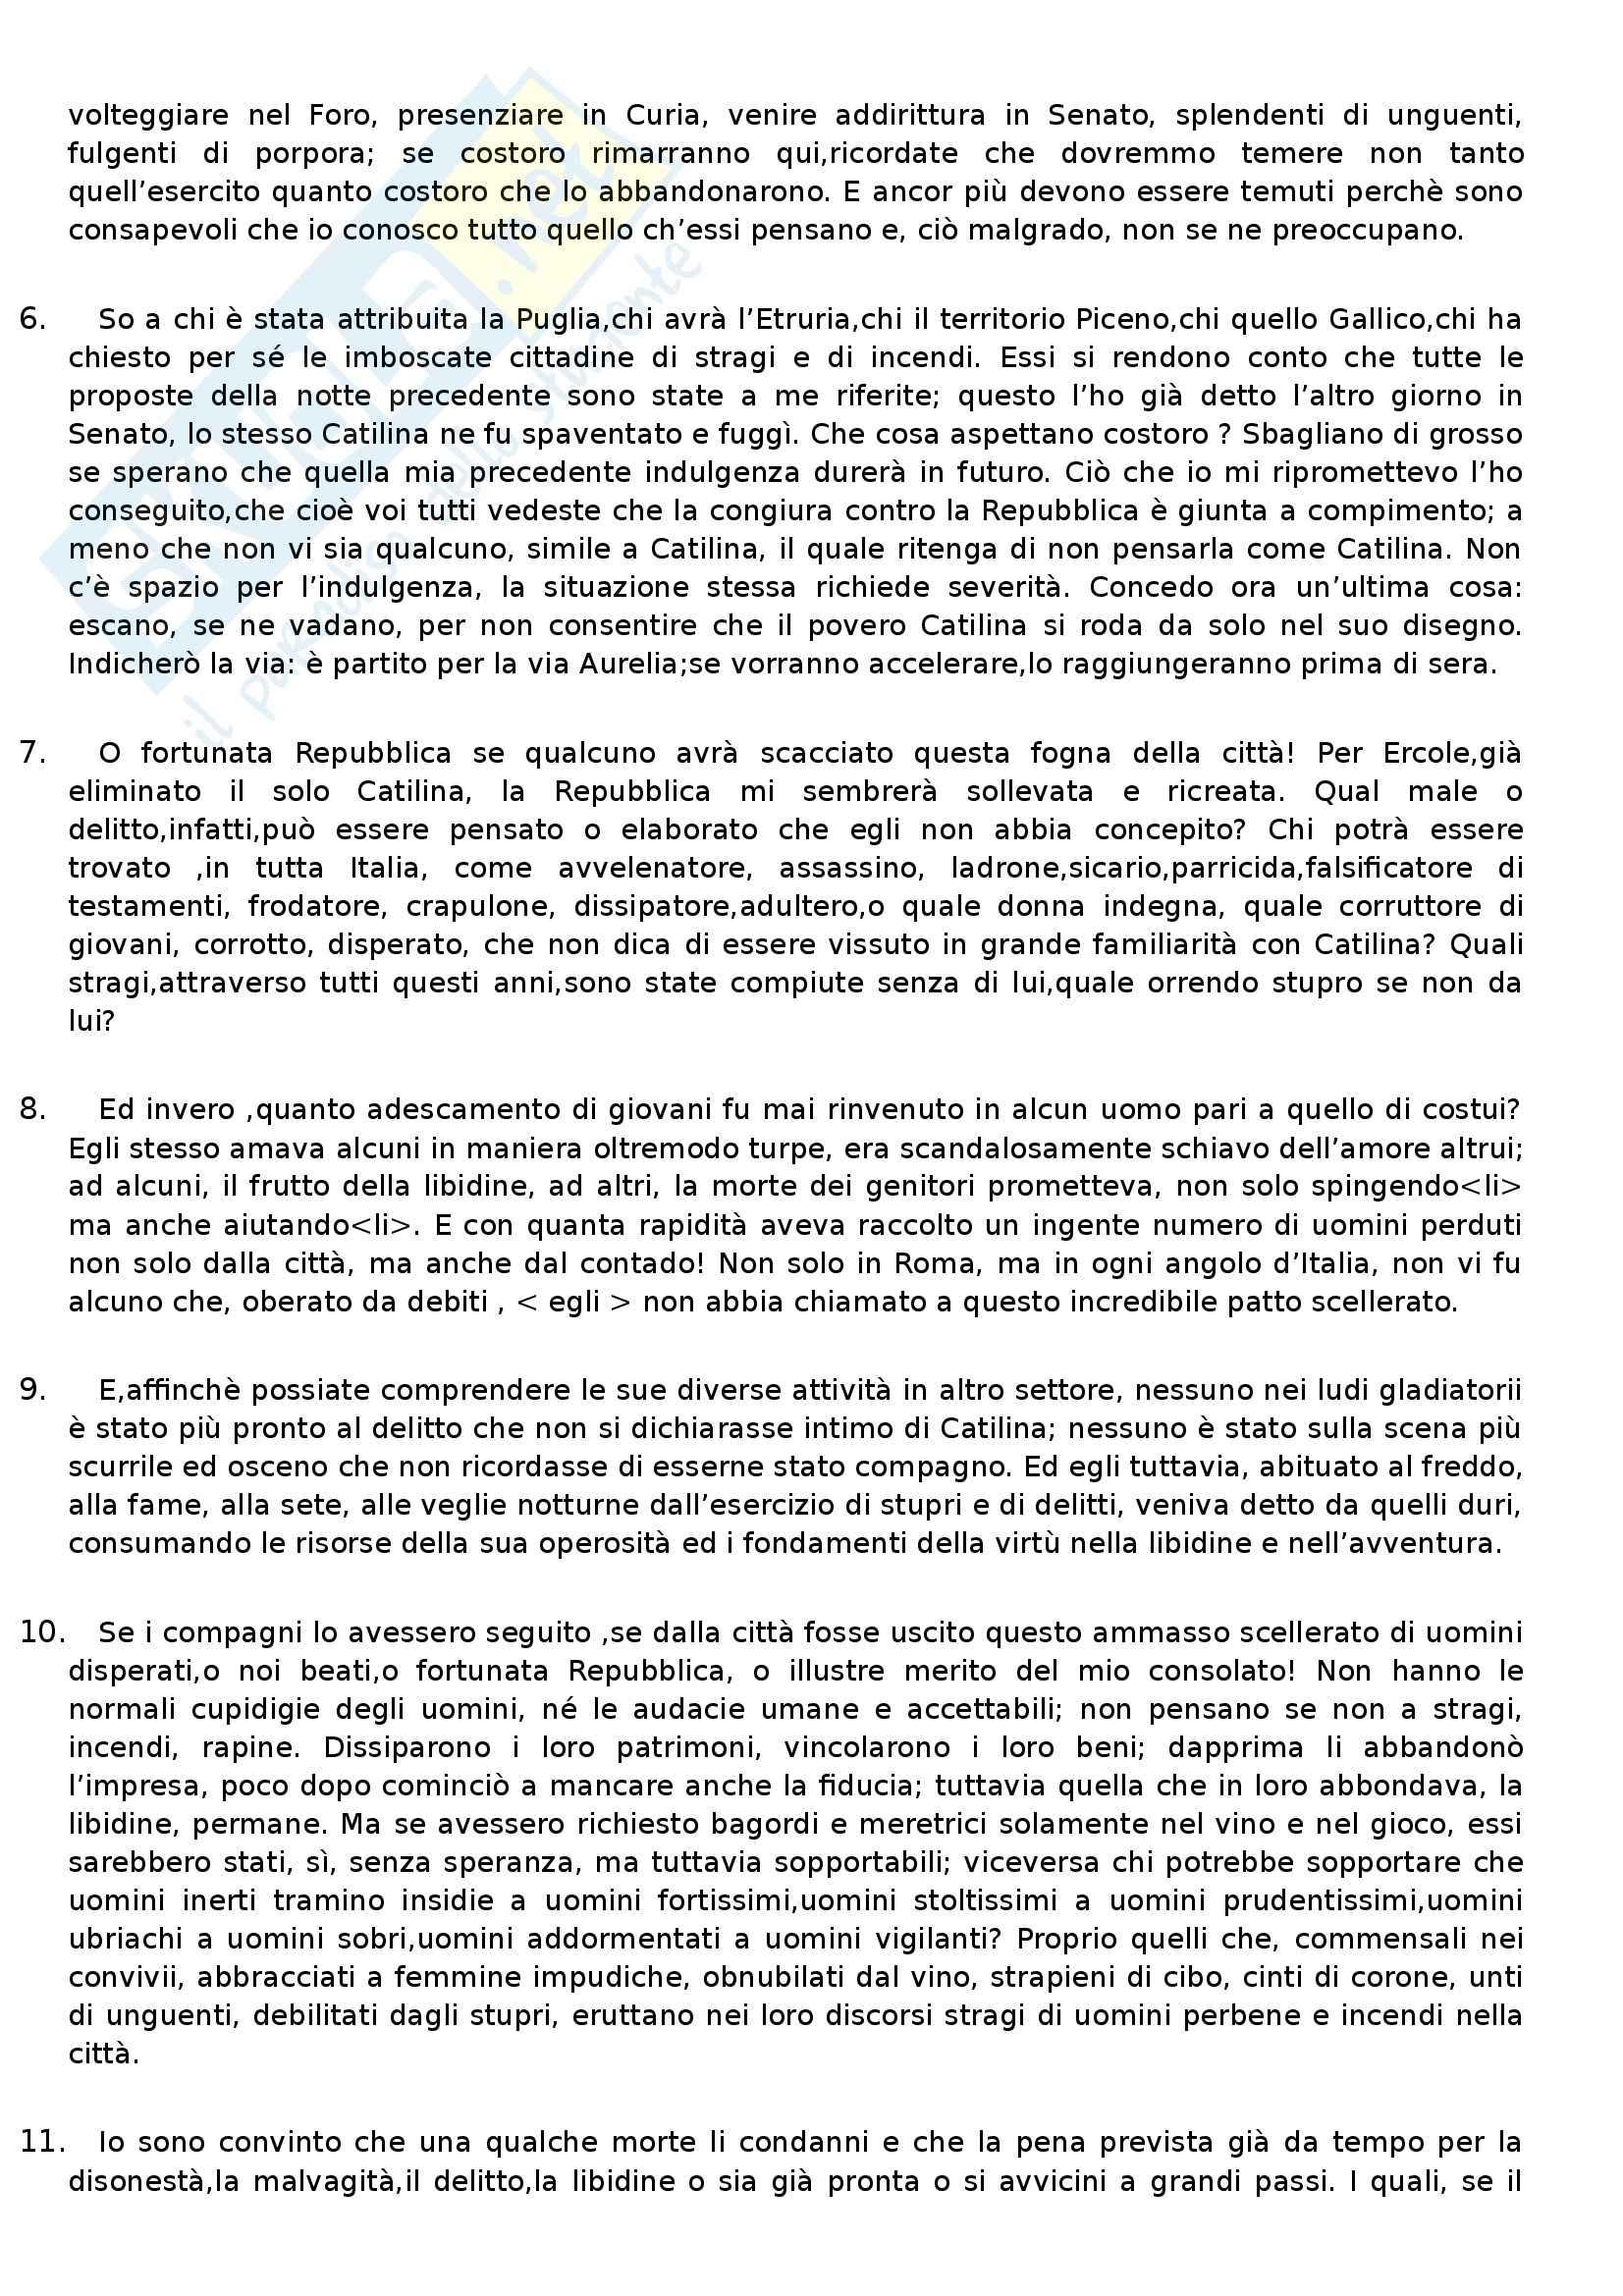 Letteratura latina  - Cicerone, Catilinaria II Pag. 2